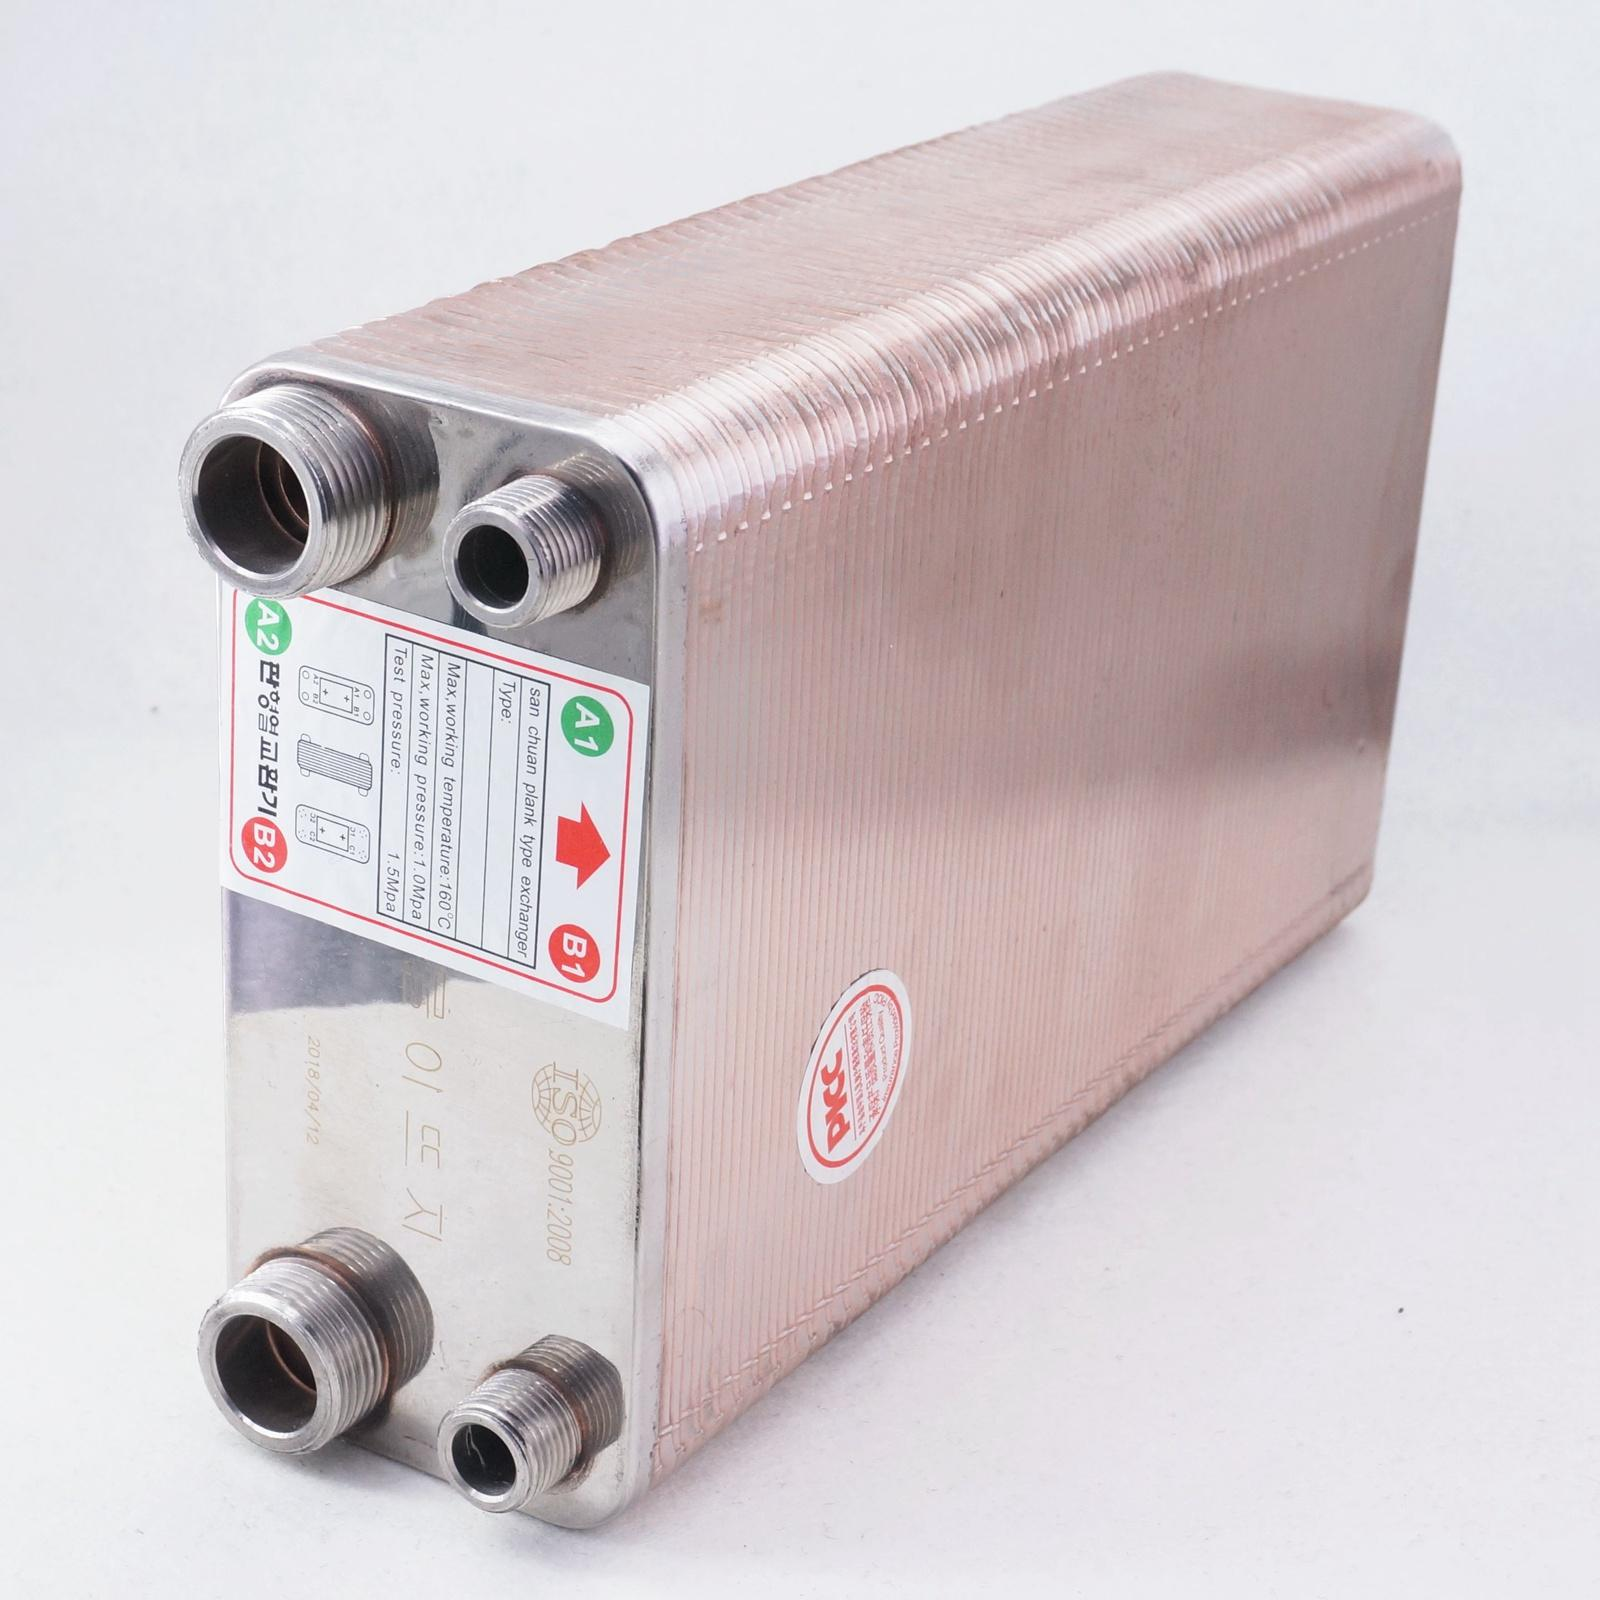 100 Plates Wort Chiller Cooler Heat Exchanger SUS 304 Stainless Steel Home Brew Beer Wine Making